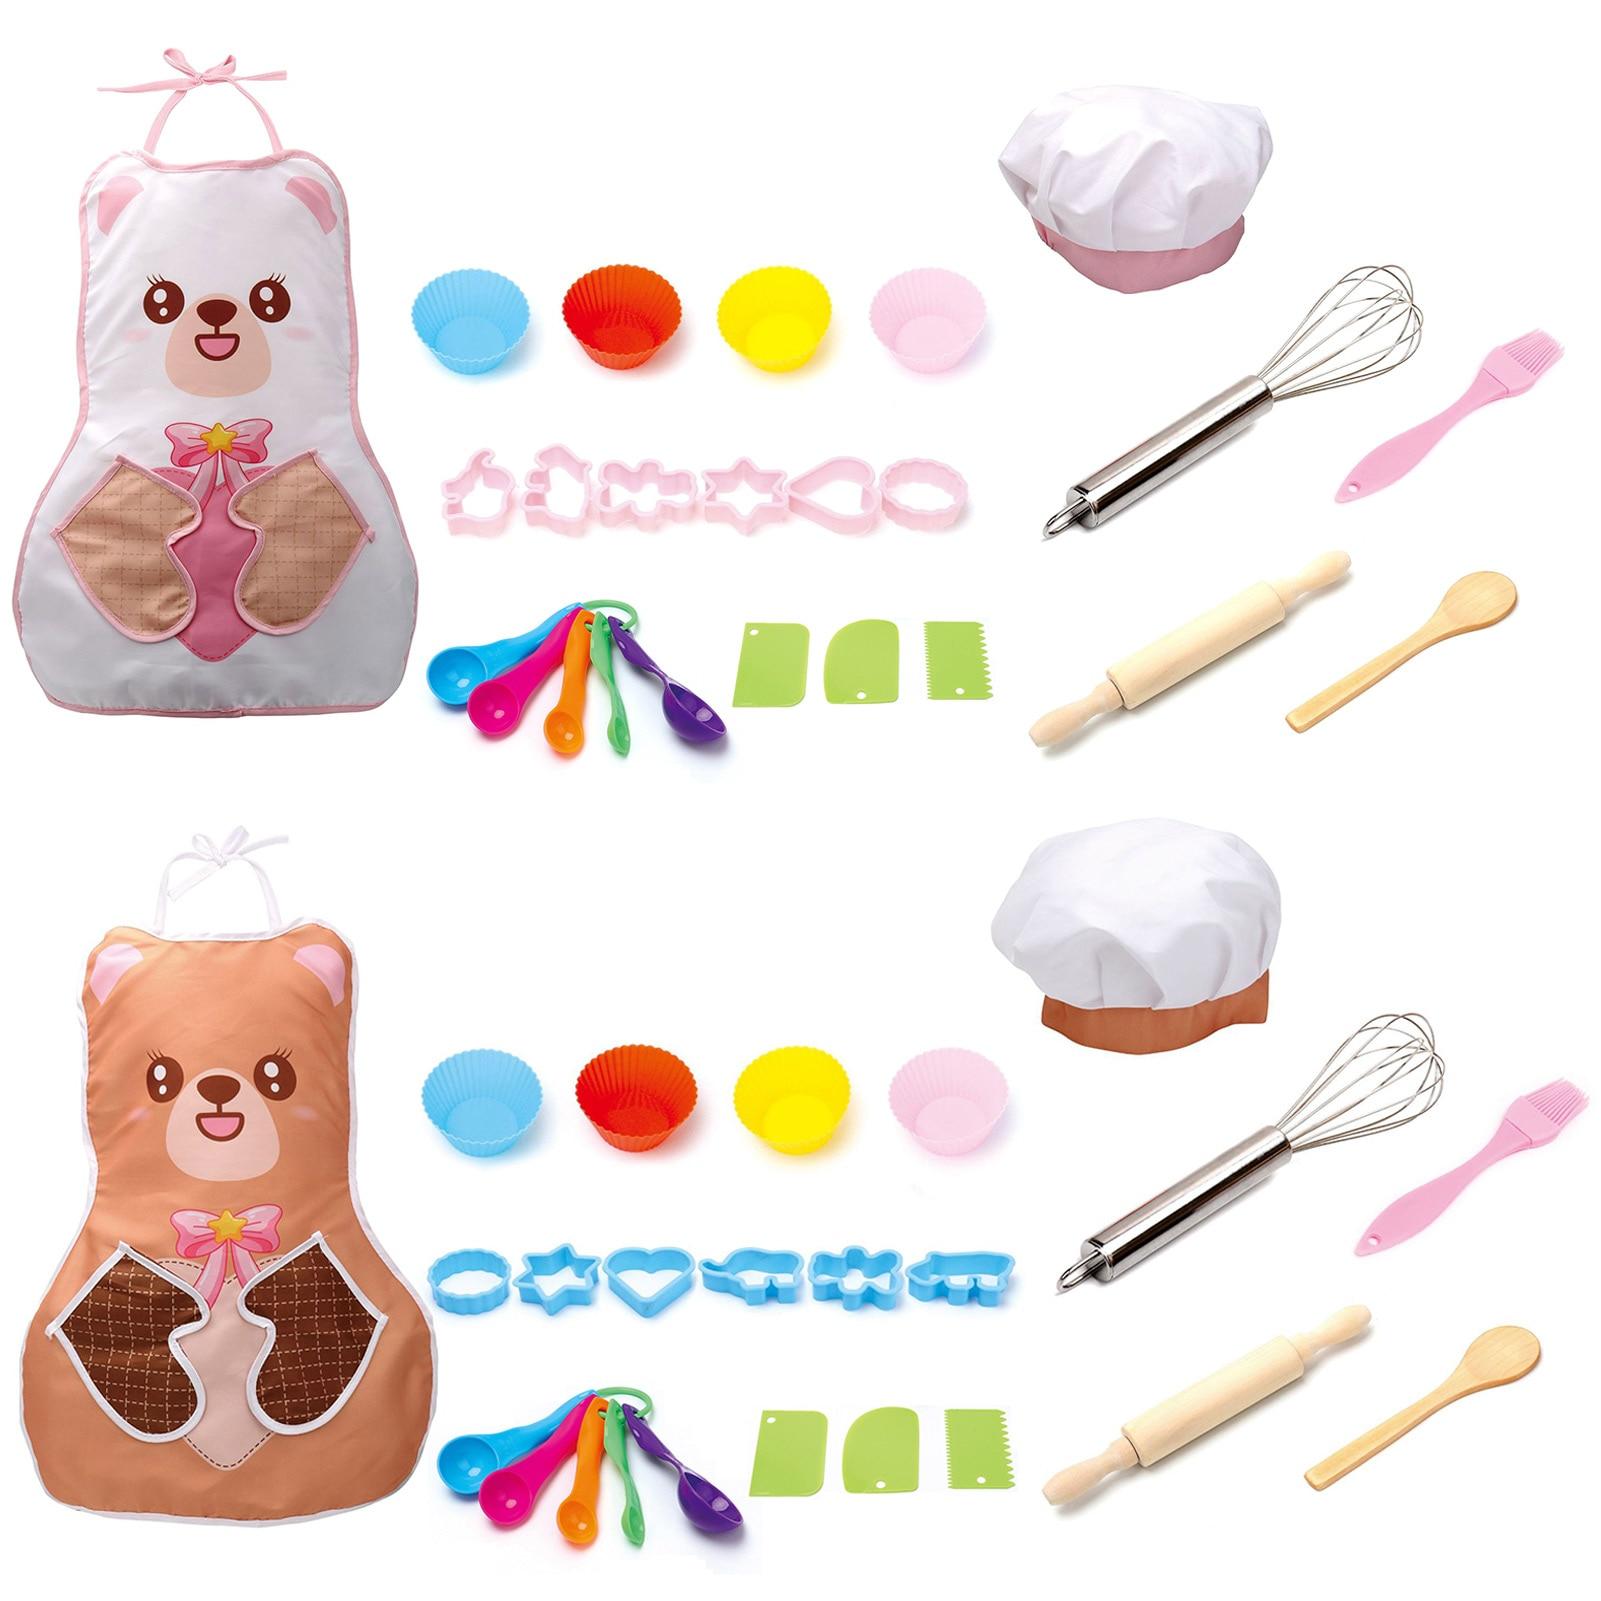 Play House Kitchen Toys Cooking Utensils Childrens Set Baking Tools Cartoon Bear Apron DIY